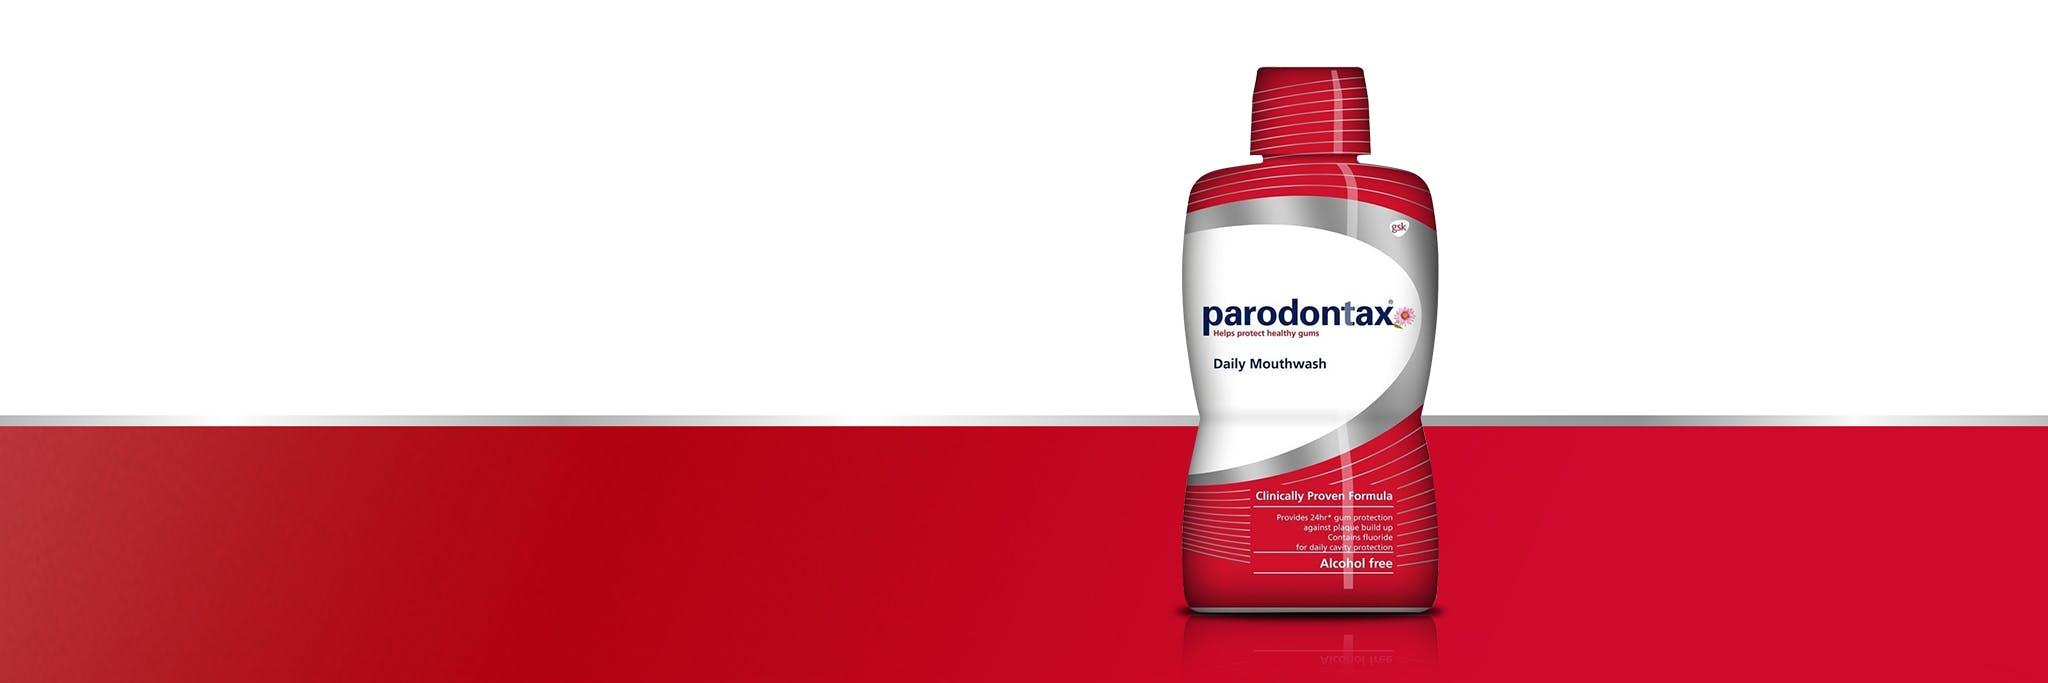 parodontax Daily mouthwash product range